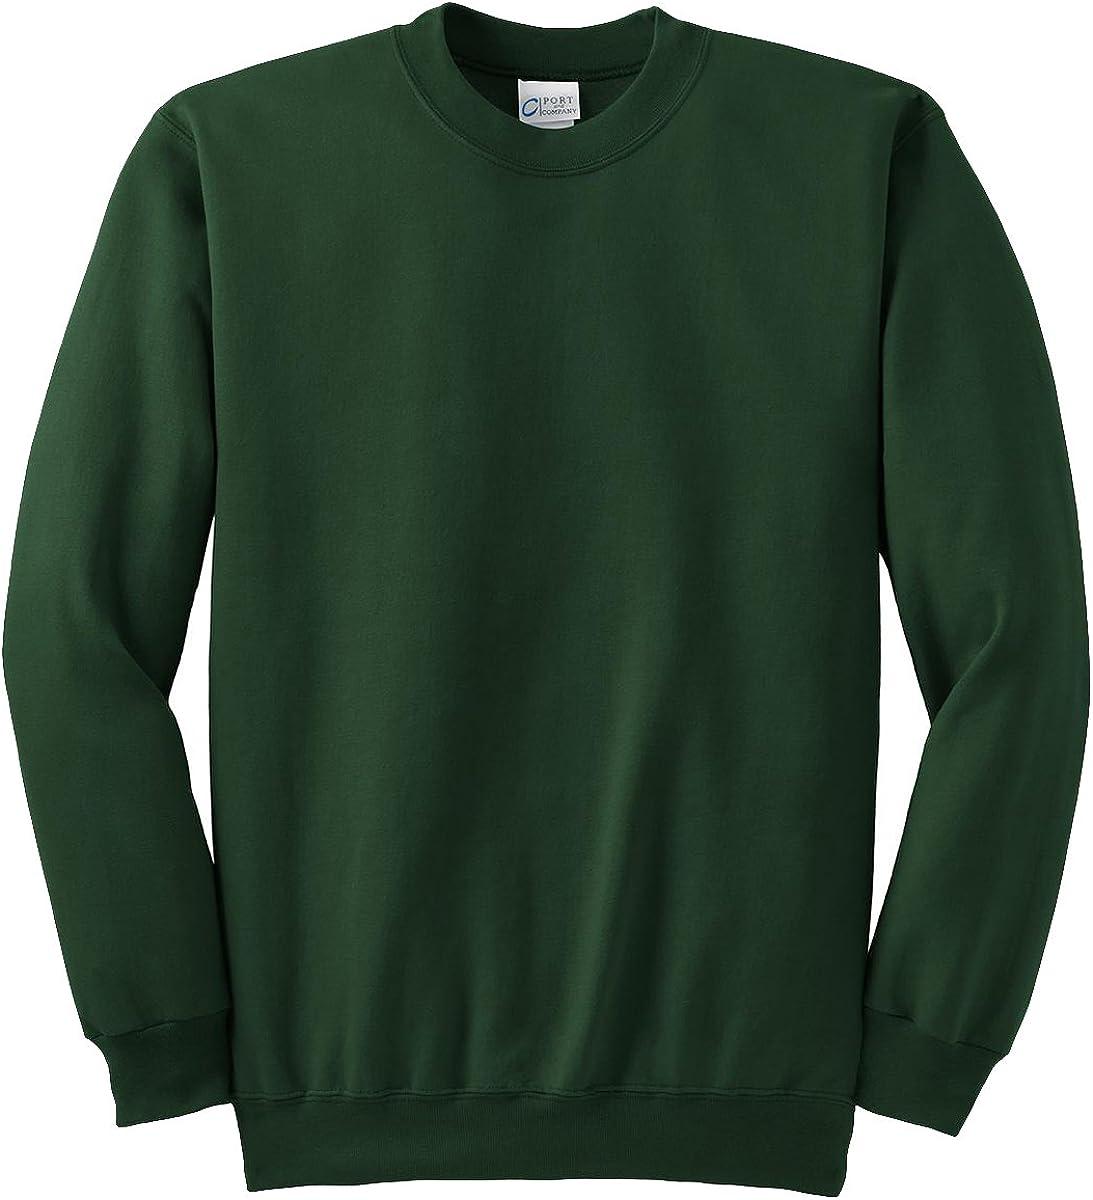 Port & Company Tall Ultimate Crewneck Sweatshirt>4XLT Cardinal PC90T